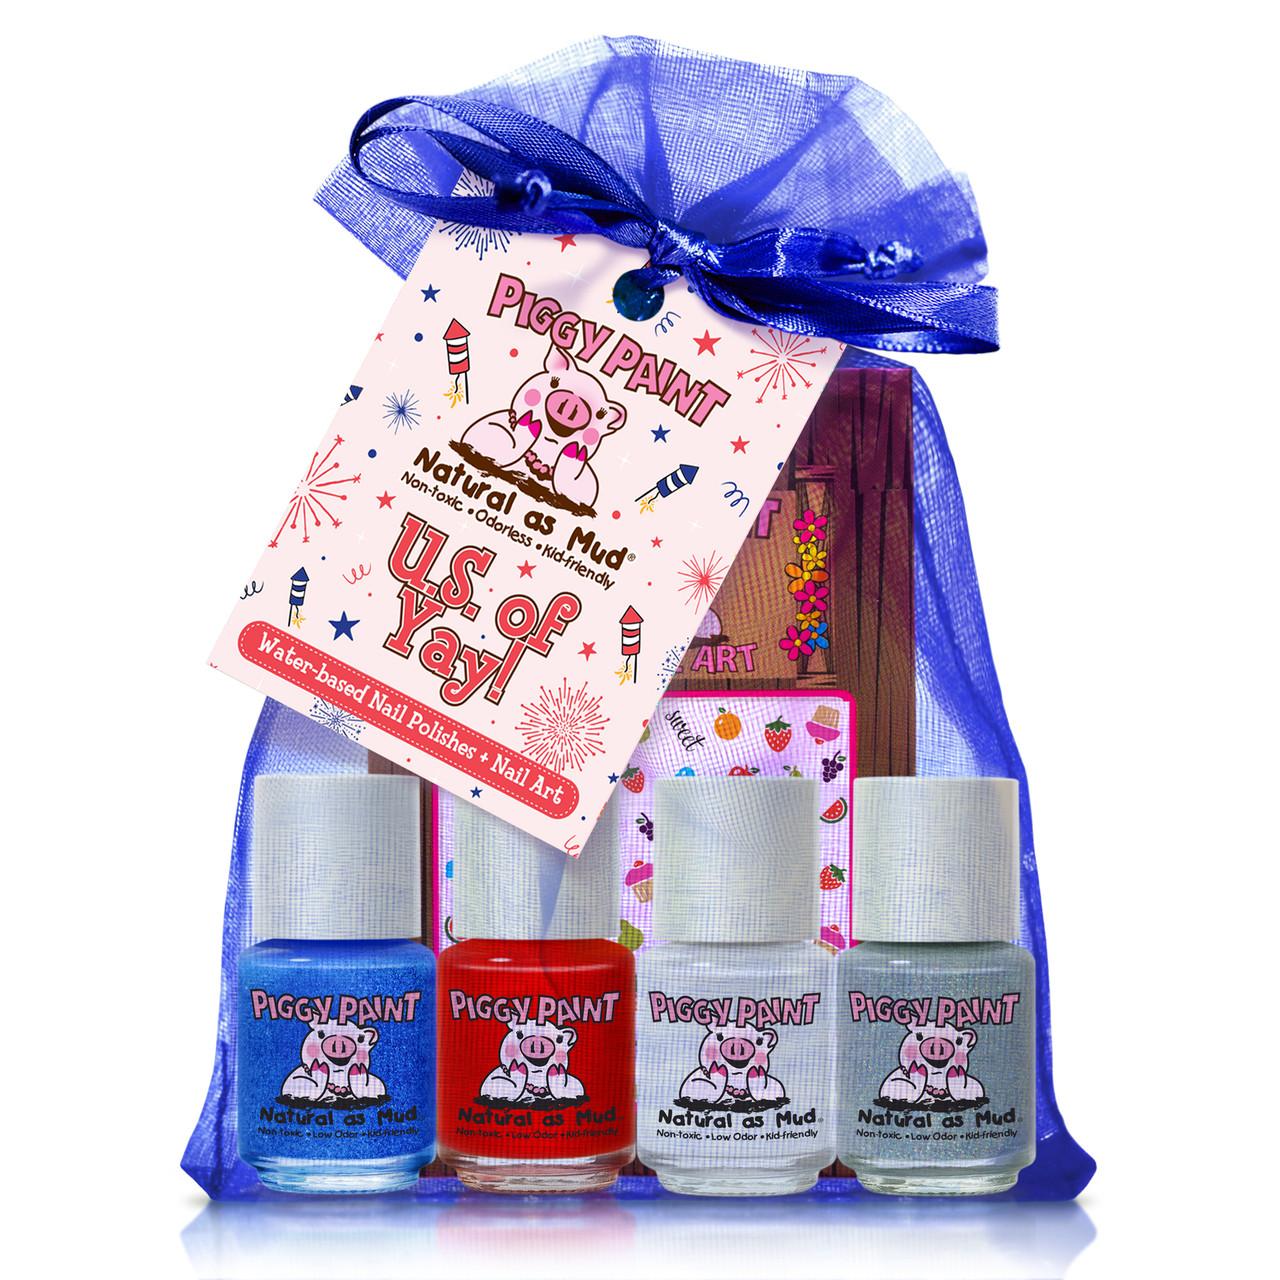 Piggy Paint U.S. of YAY! Gift Set